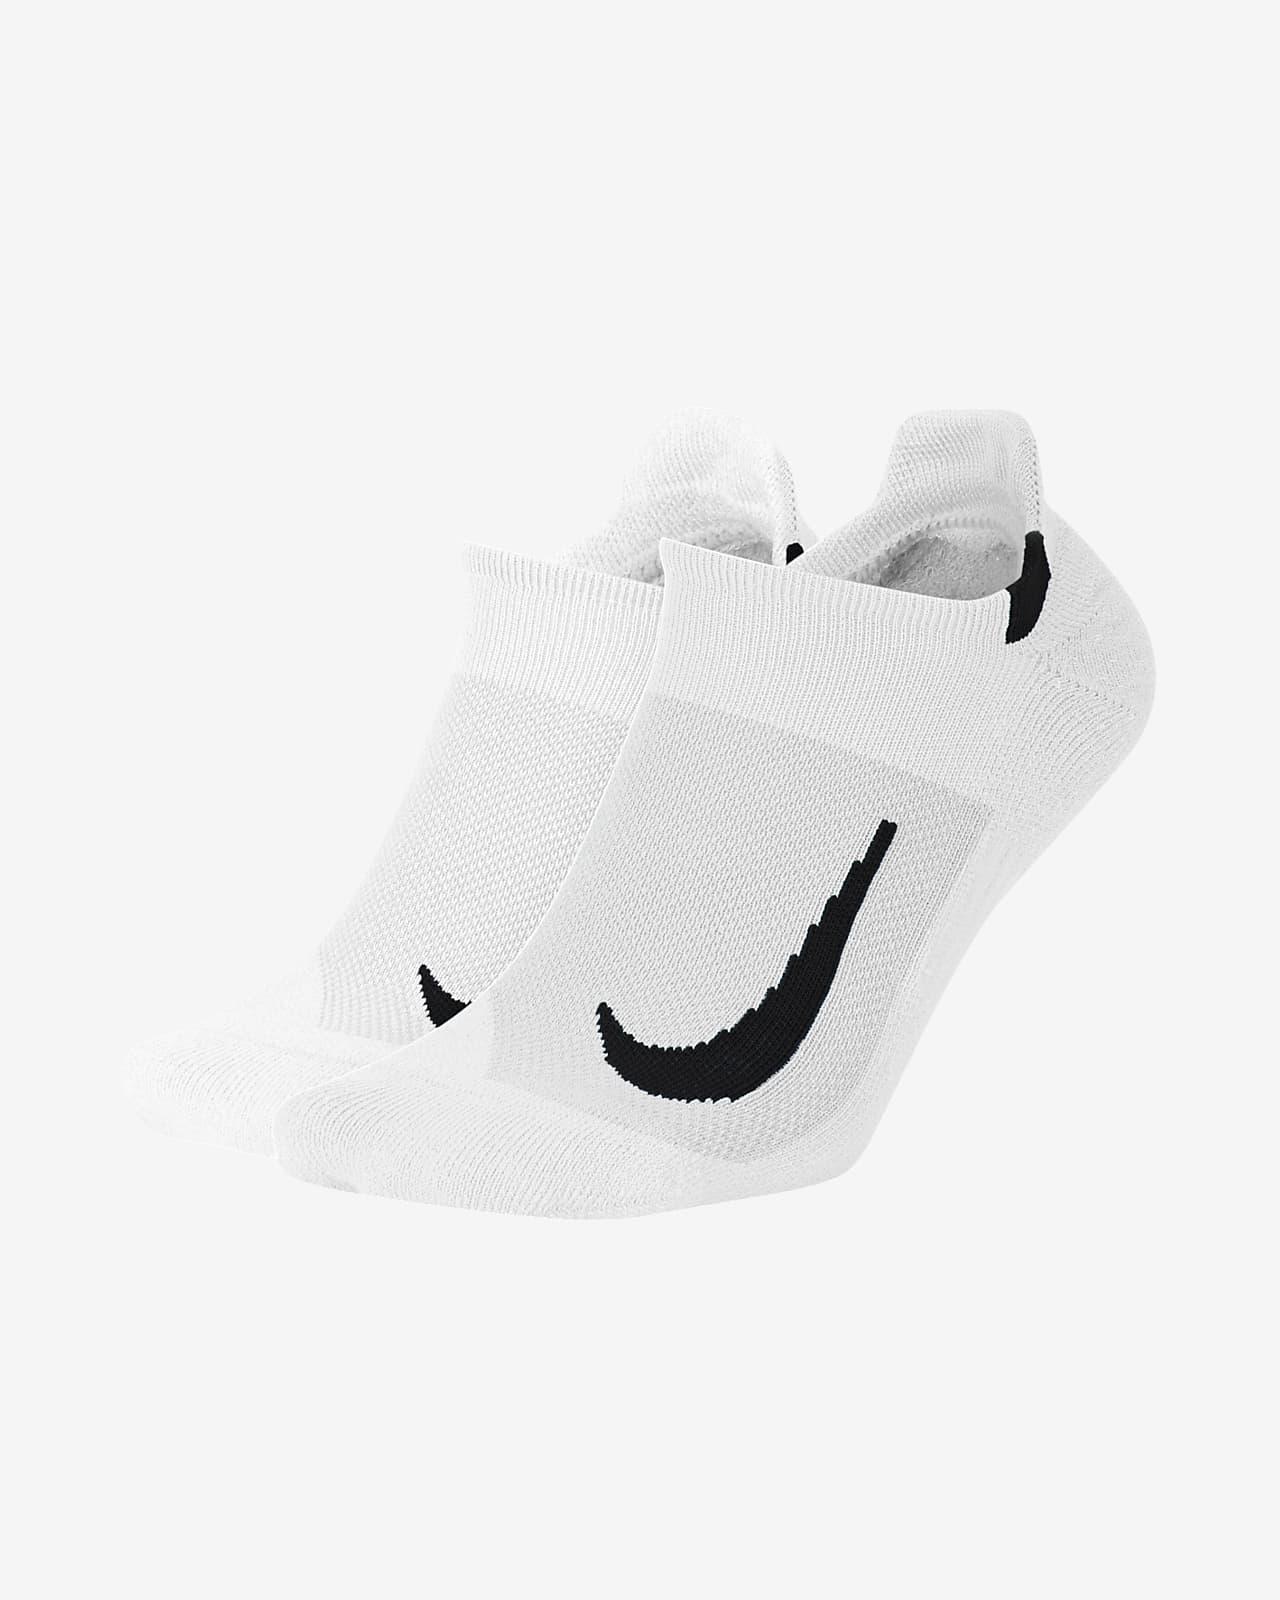 Fantasmini da running Nike Multiplier (2 paia)